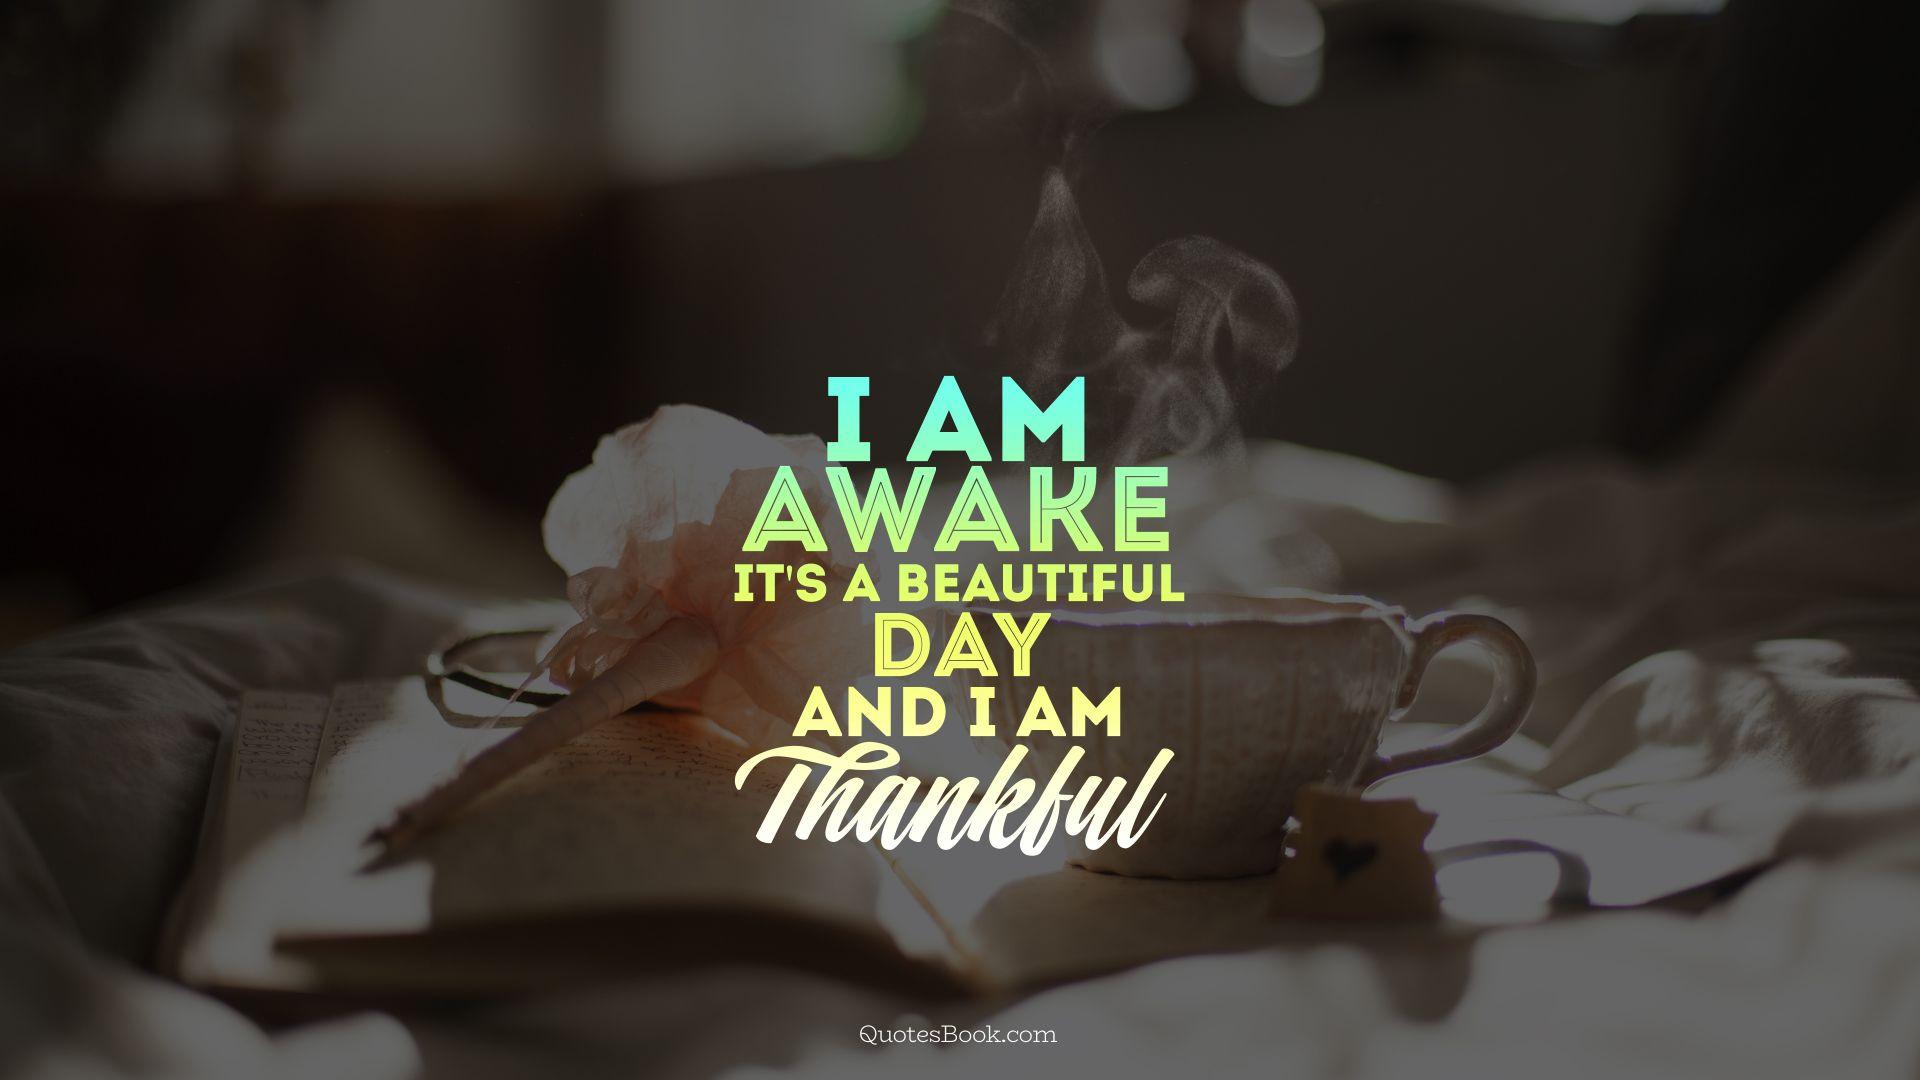 I Am Awake Its A Beautiful Day And I Am Thankful Quotesbook